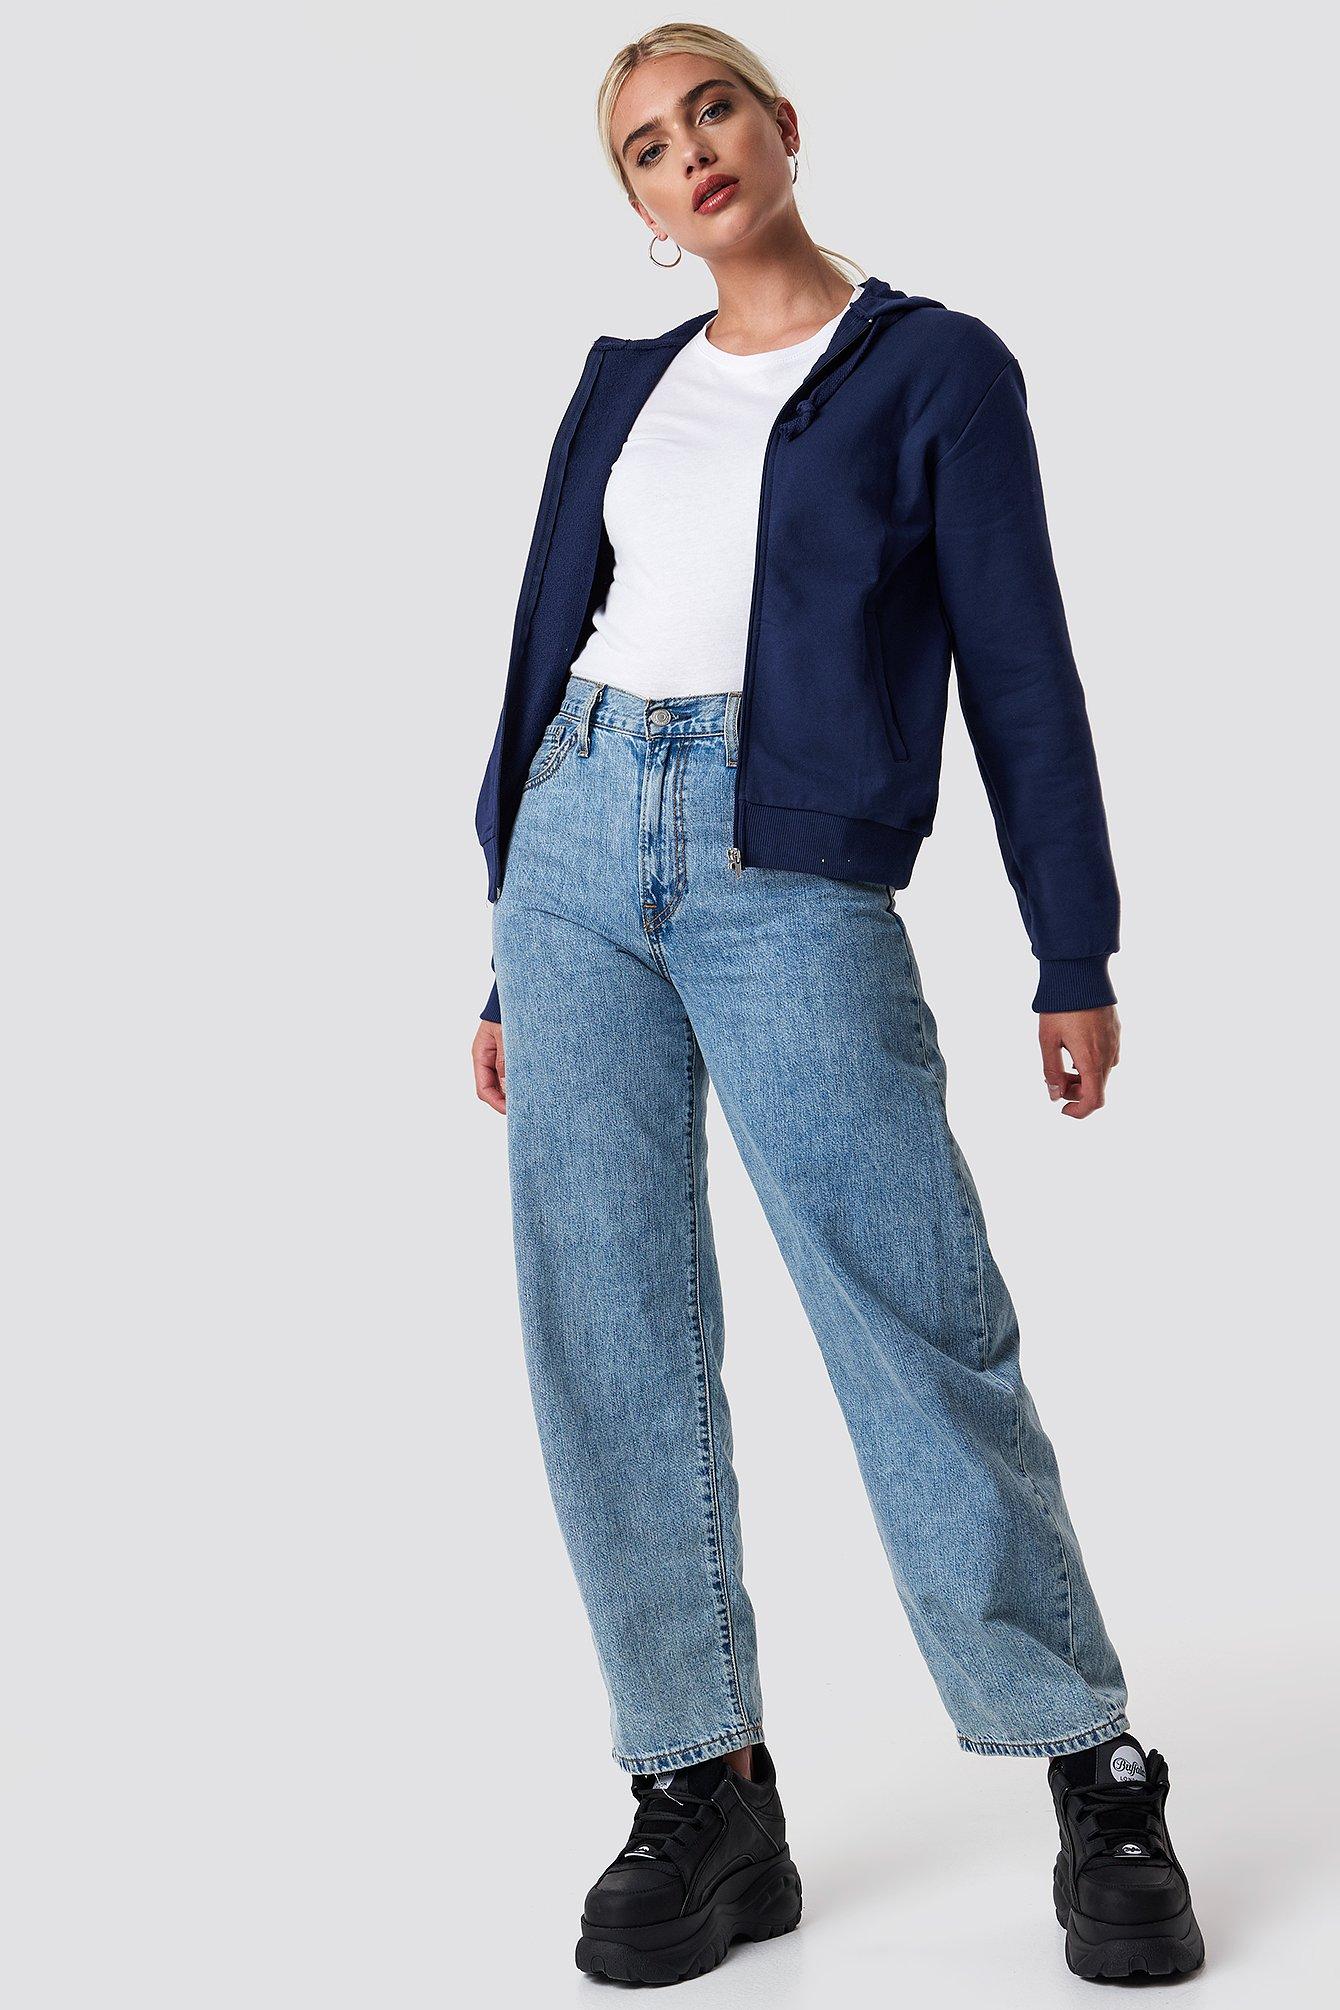 Bluza basic z kapturem NA-KD.COM